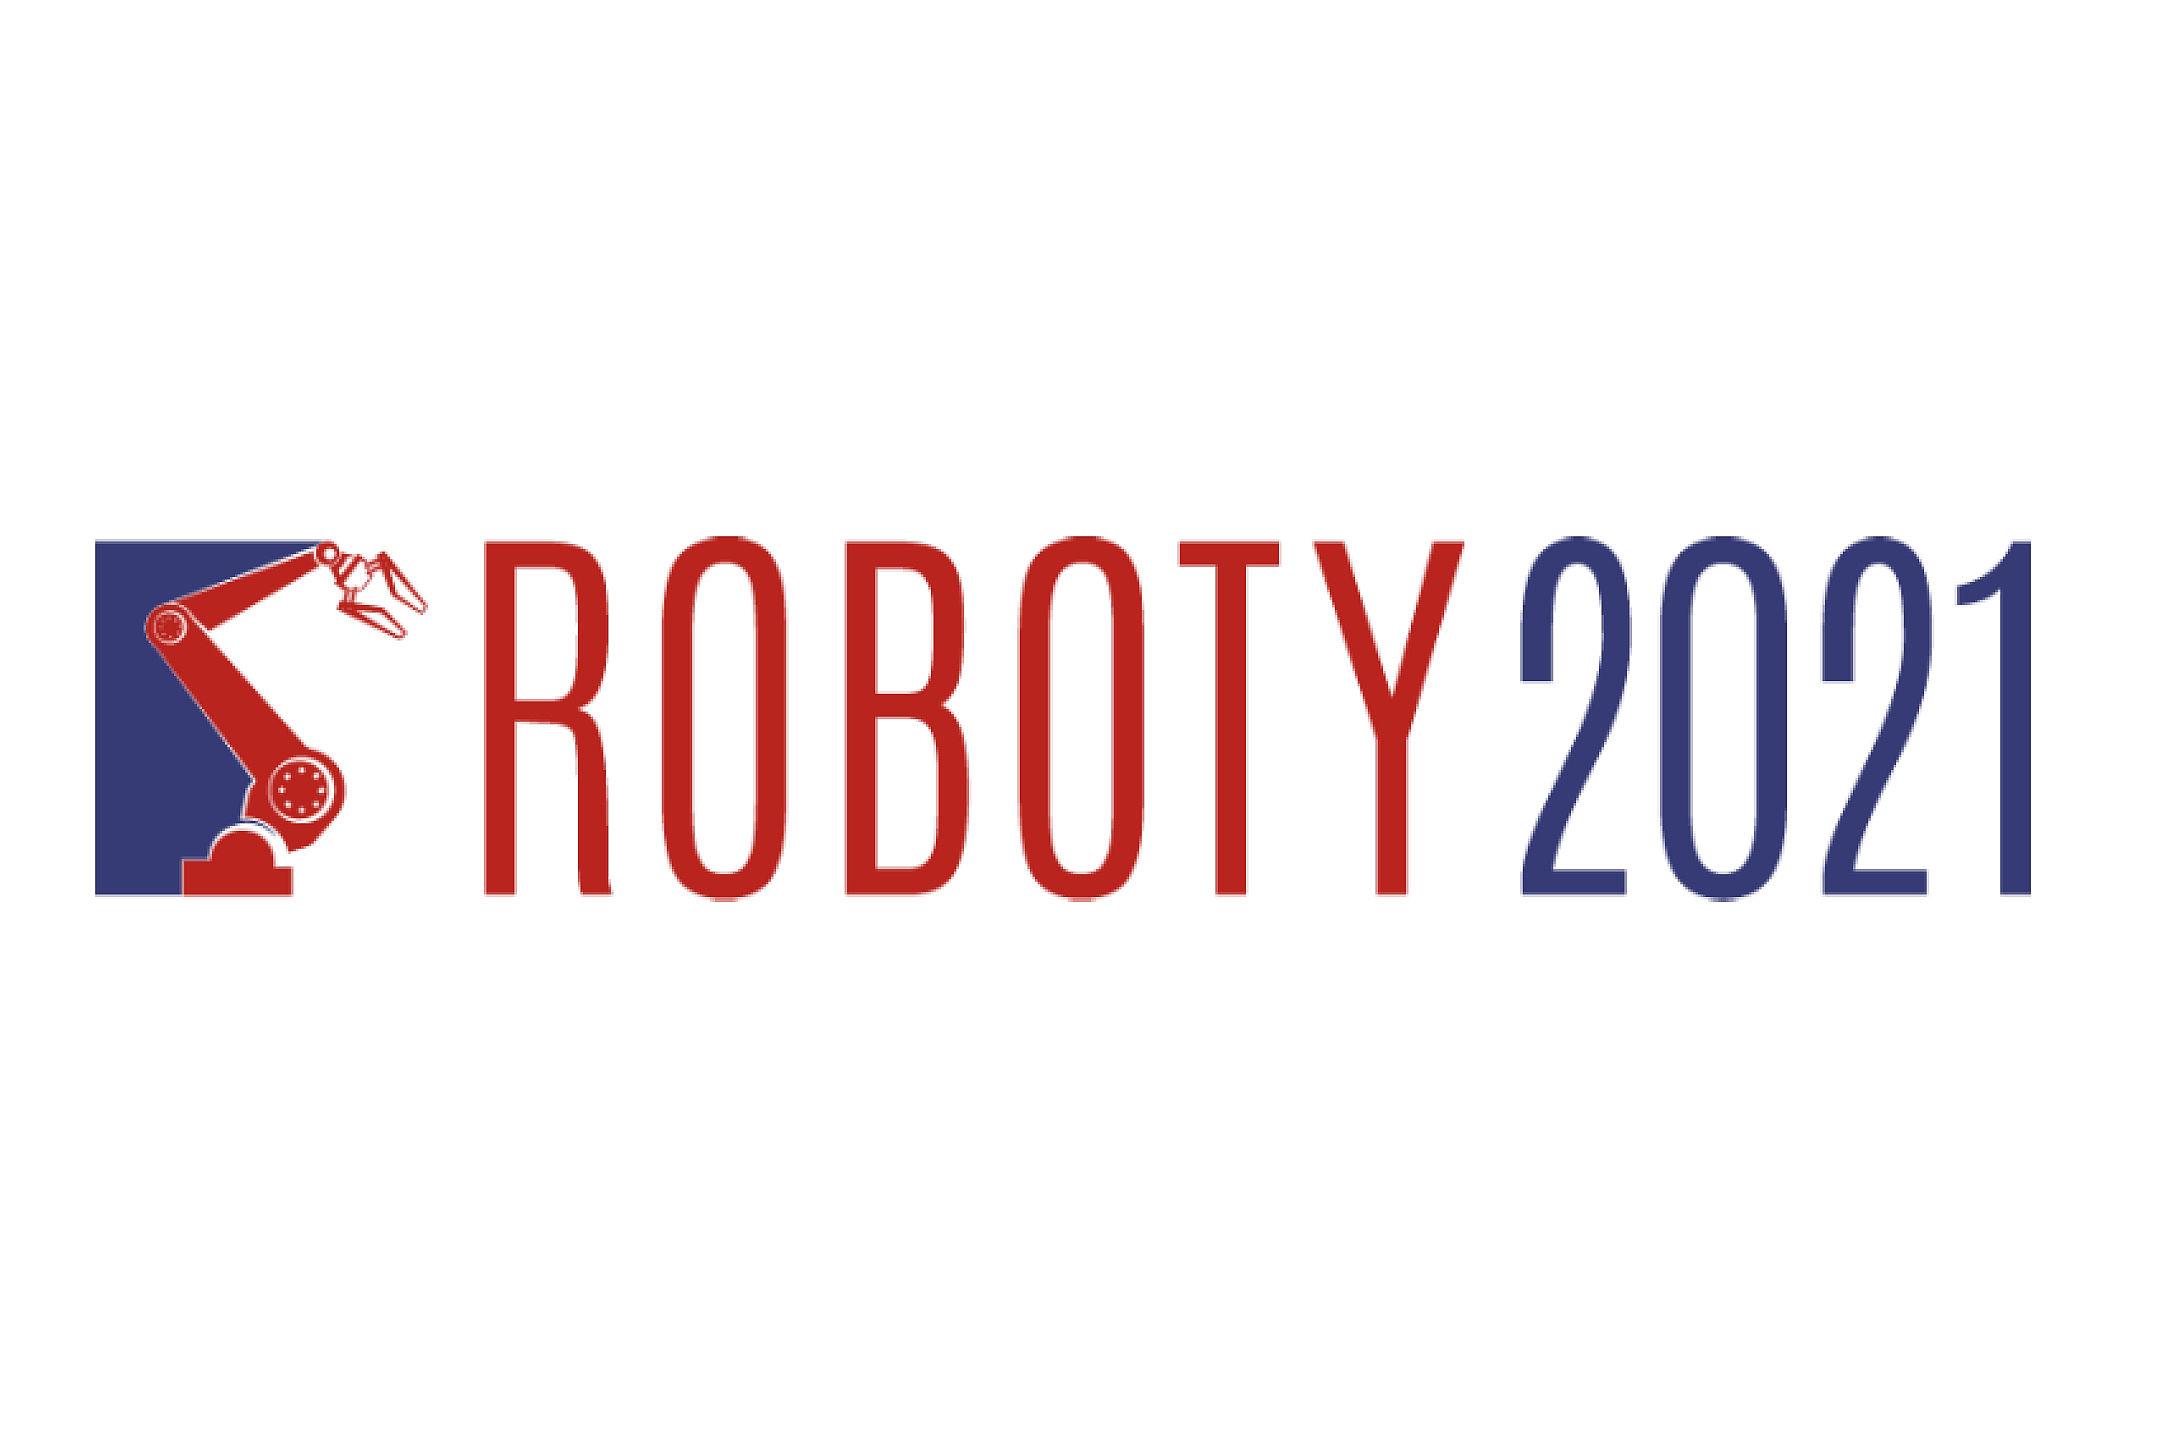 Roboty2021-logo-nim@2x.jpg.jpg